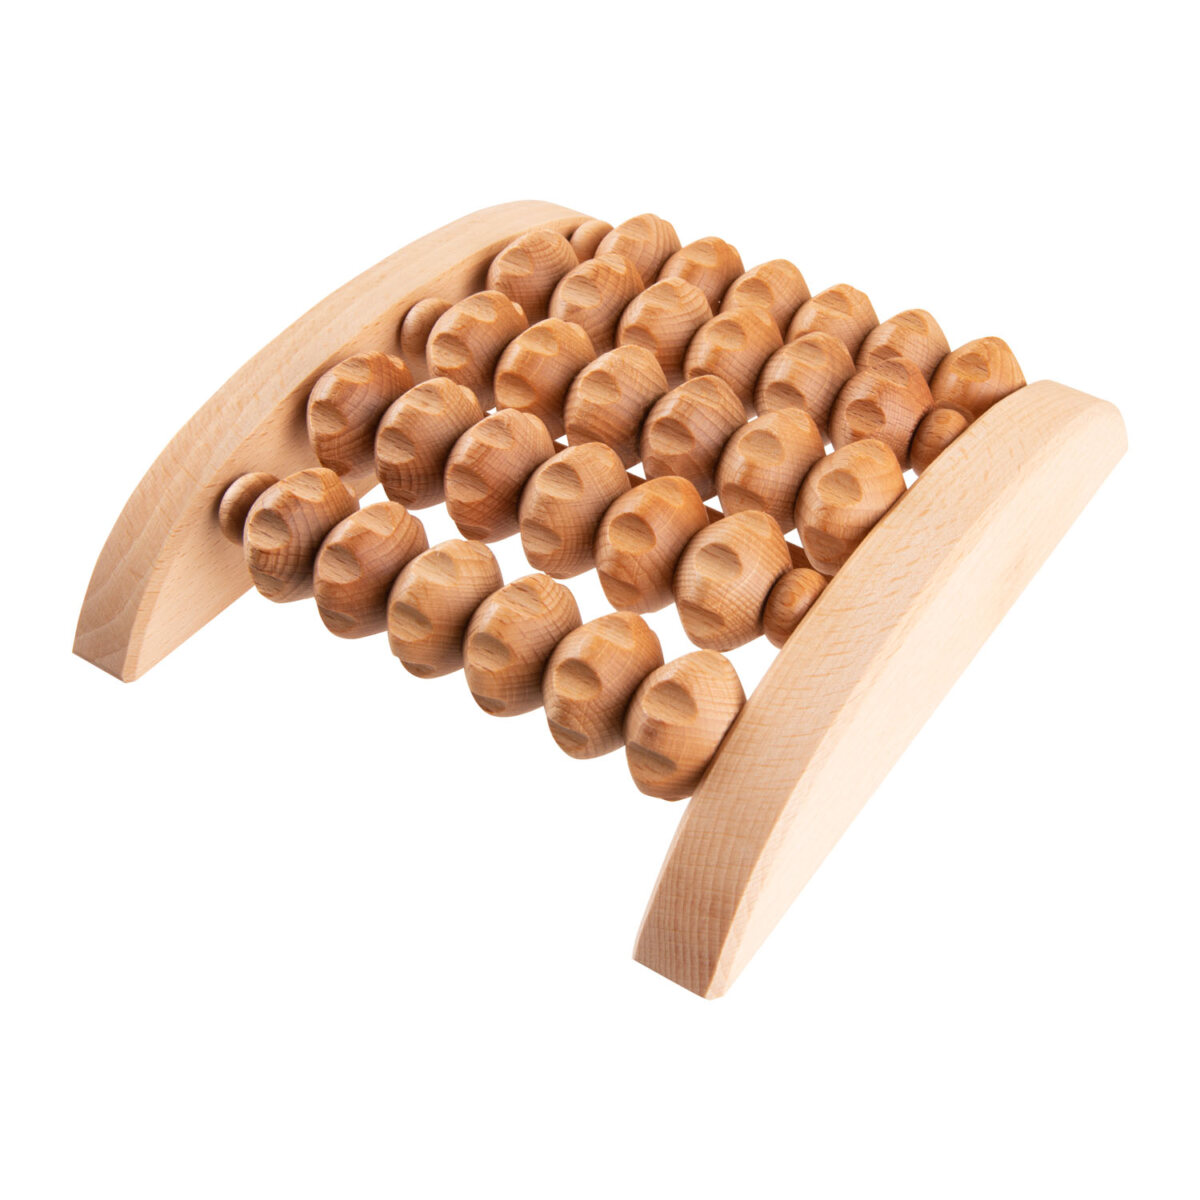 uulki wooden foot massage roller